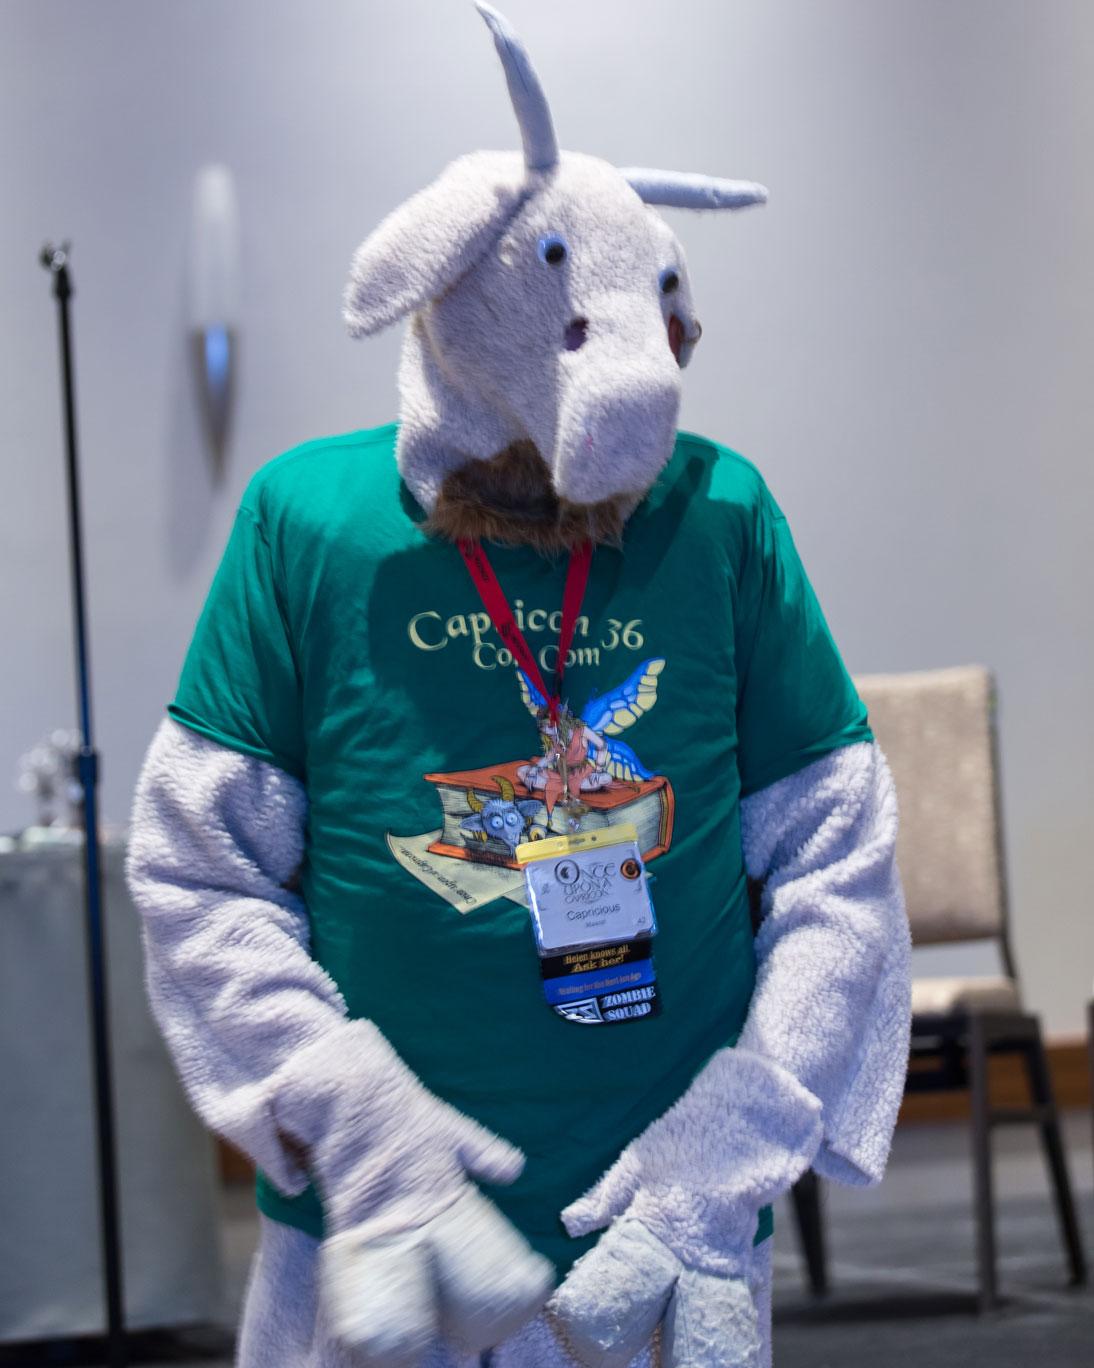 Capricious wearing the Capricon 36 Con Com shirt.